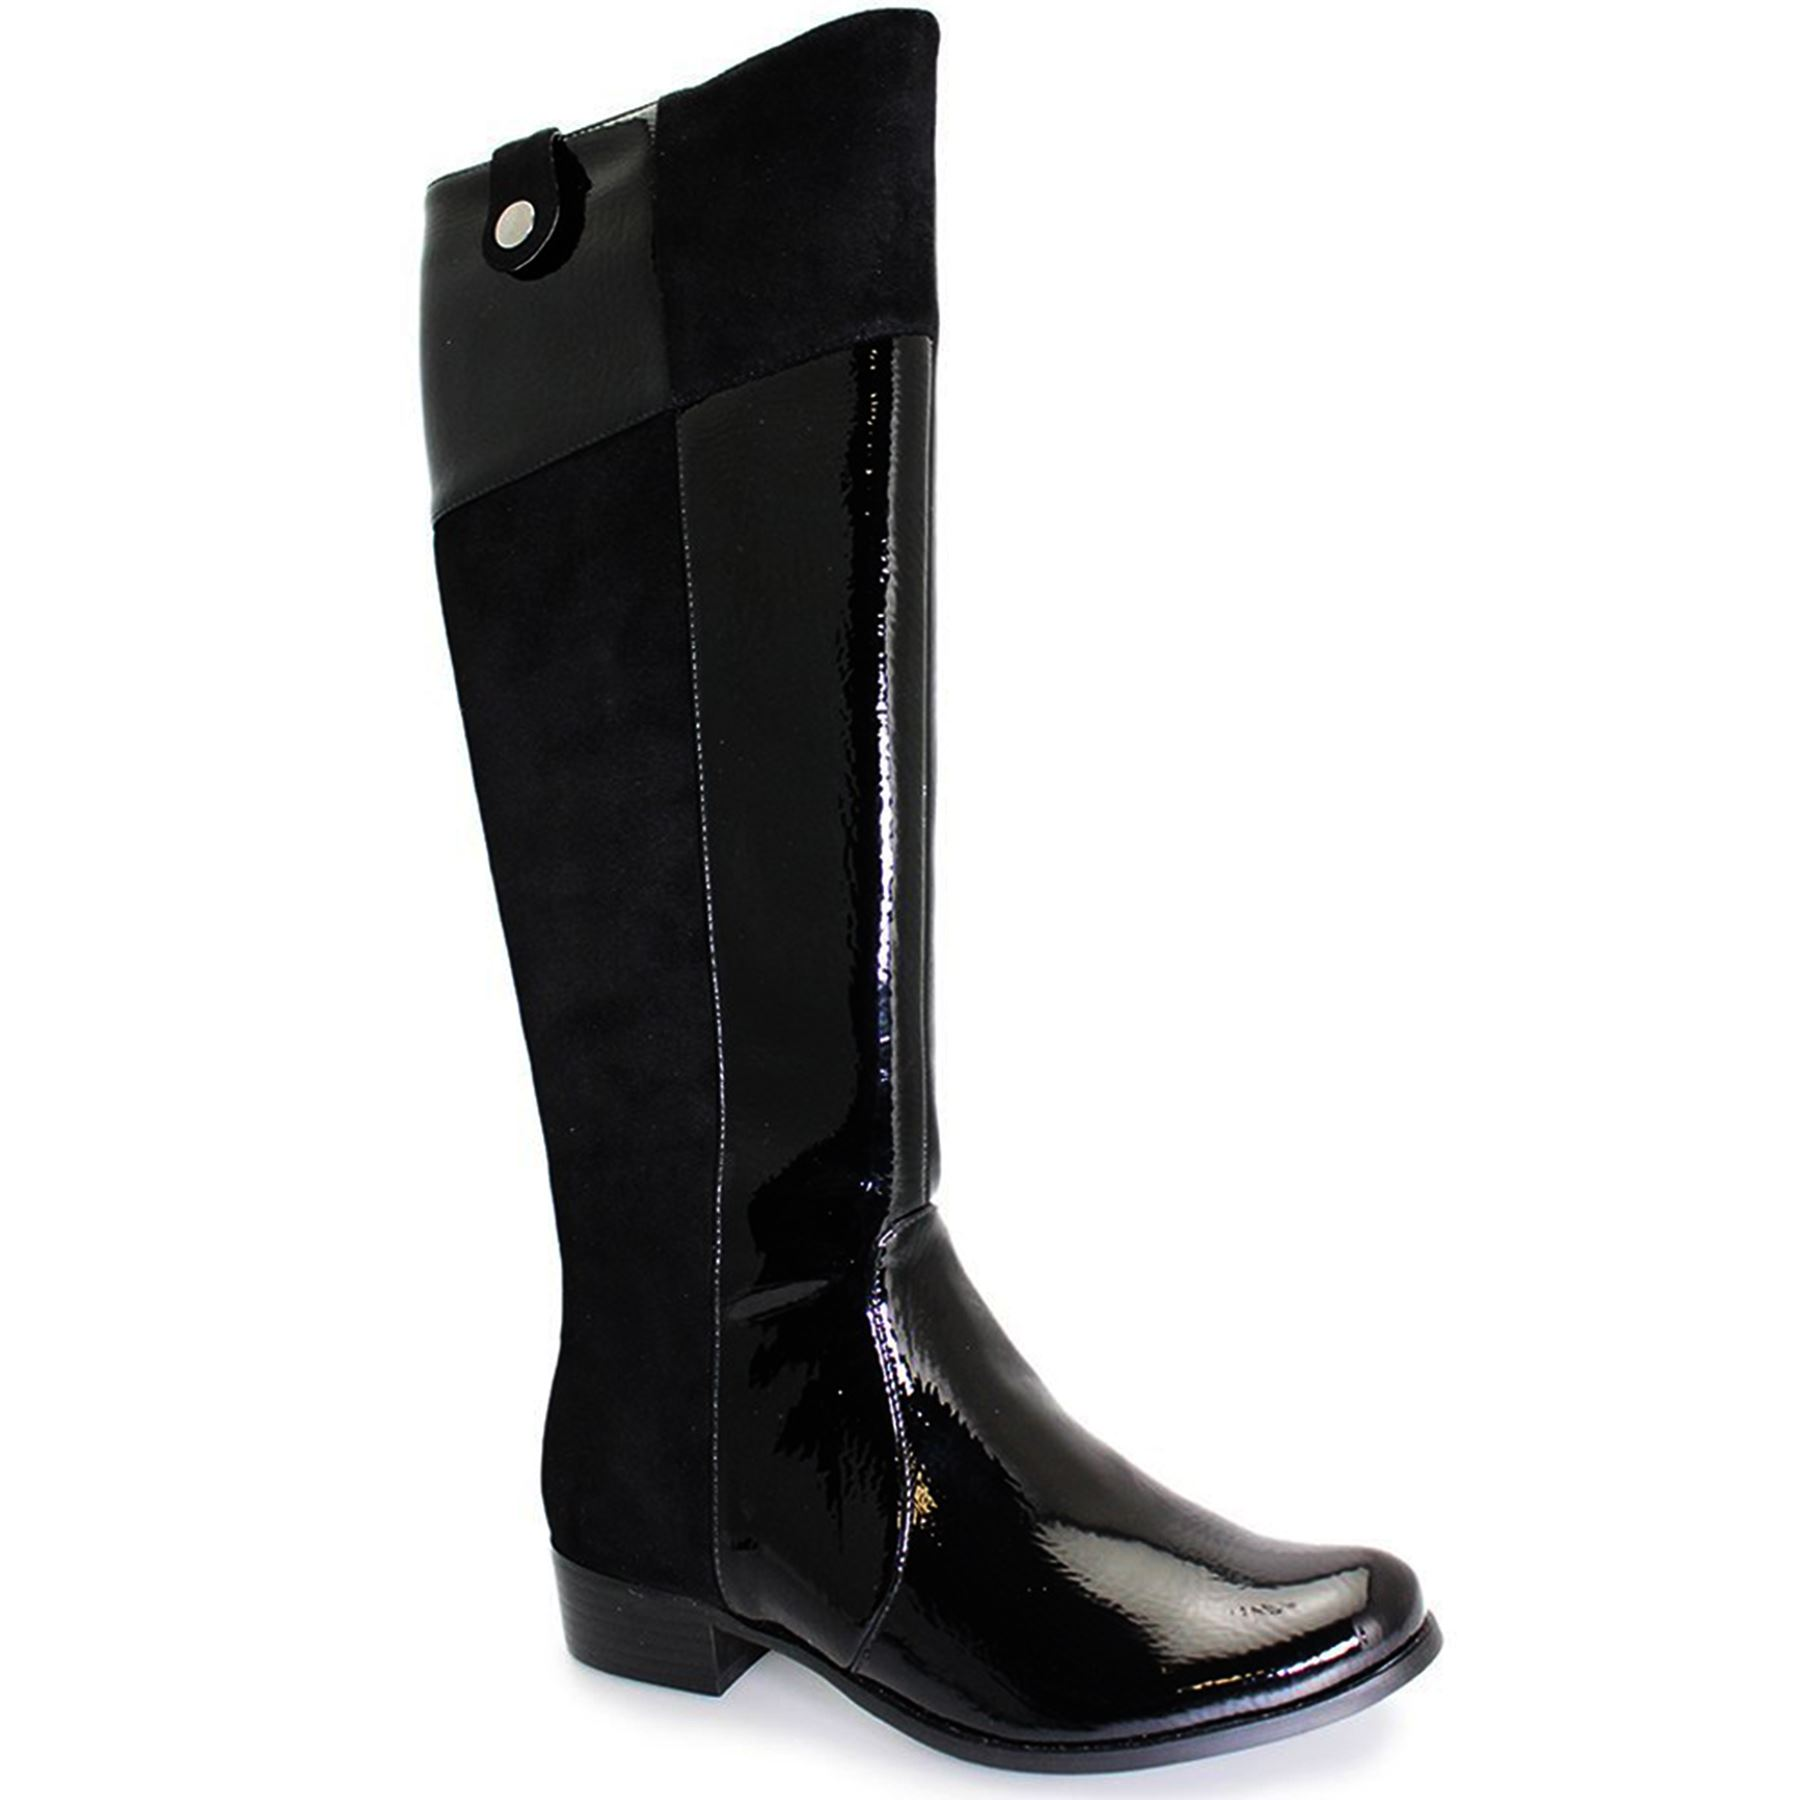 Ladies Suede Patent Contrast Low Women's Low Contrast Heel Black Knee High Boots Shoes d6eff4